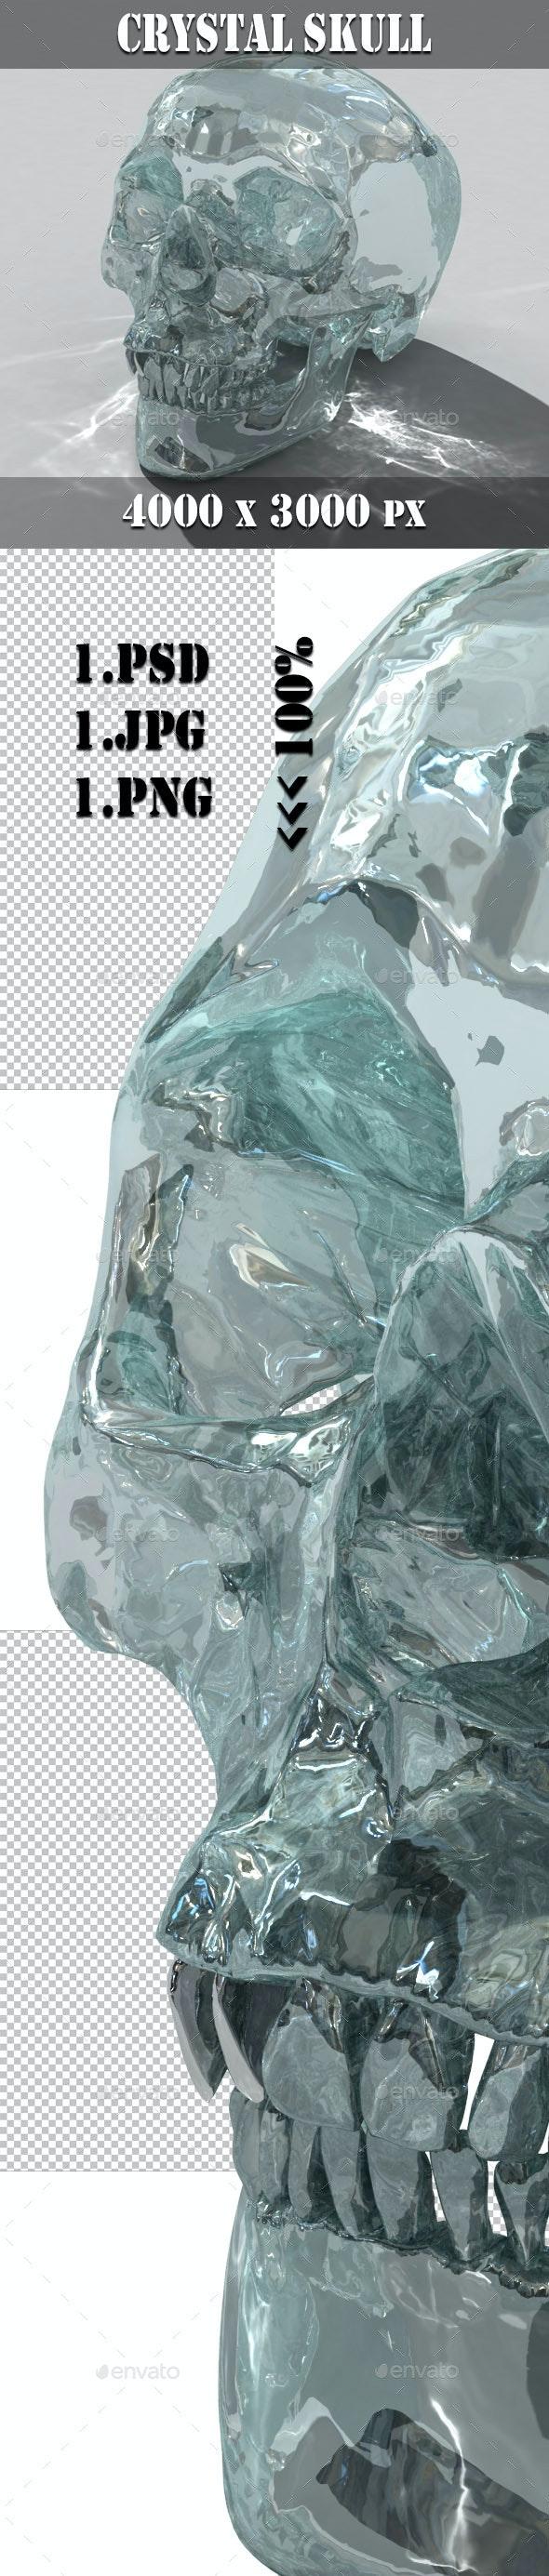 3D Crystal Skull - Objects 3D Renders